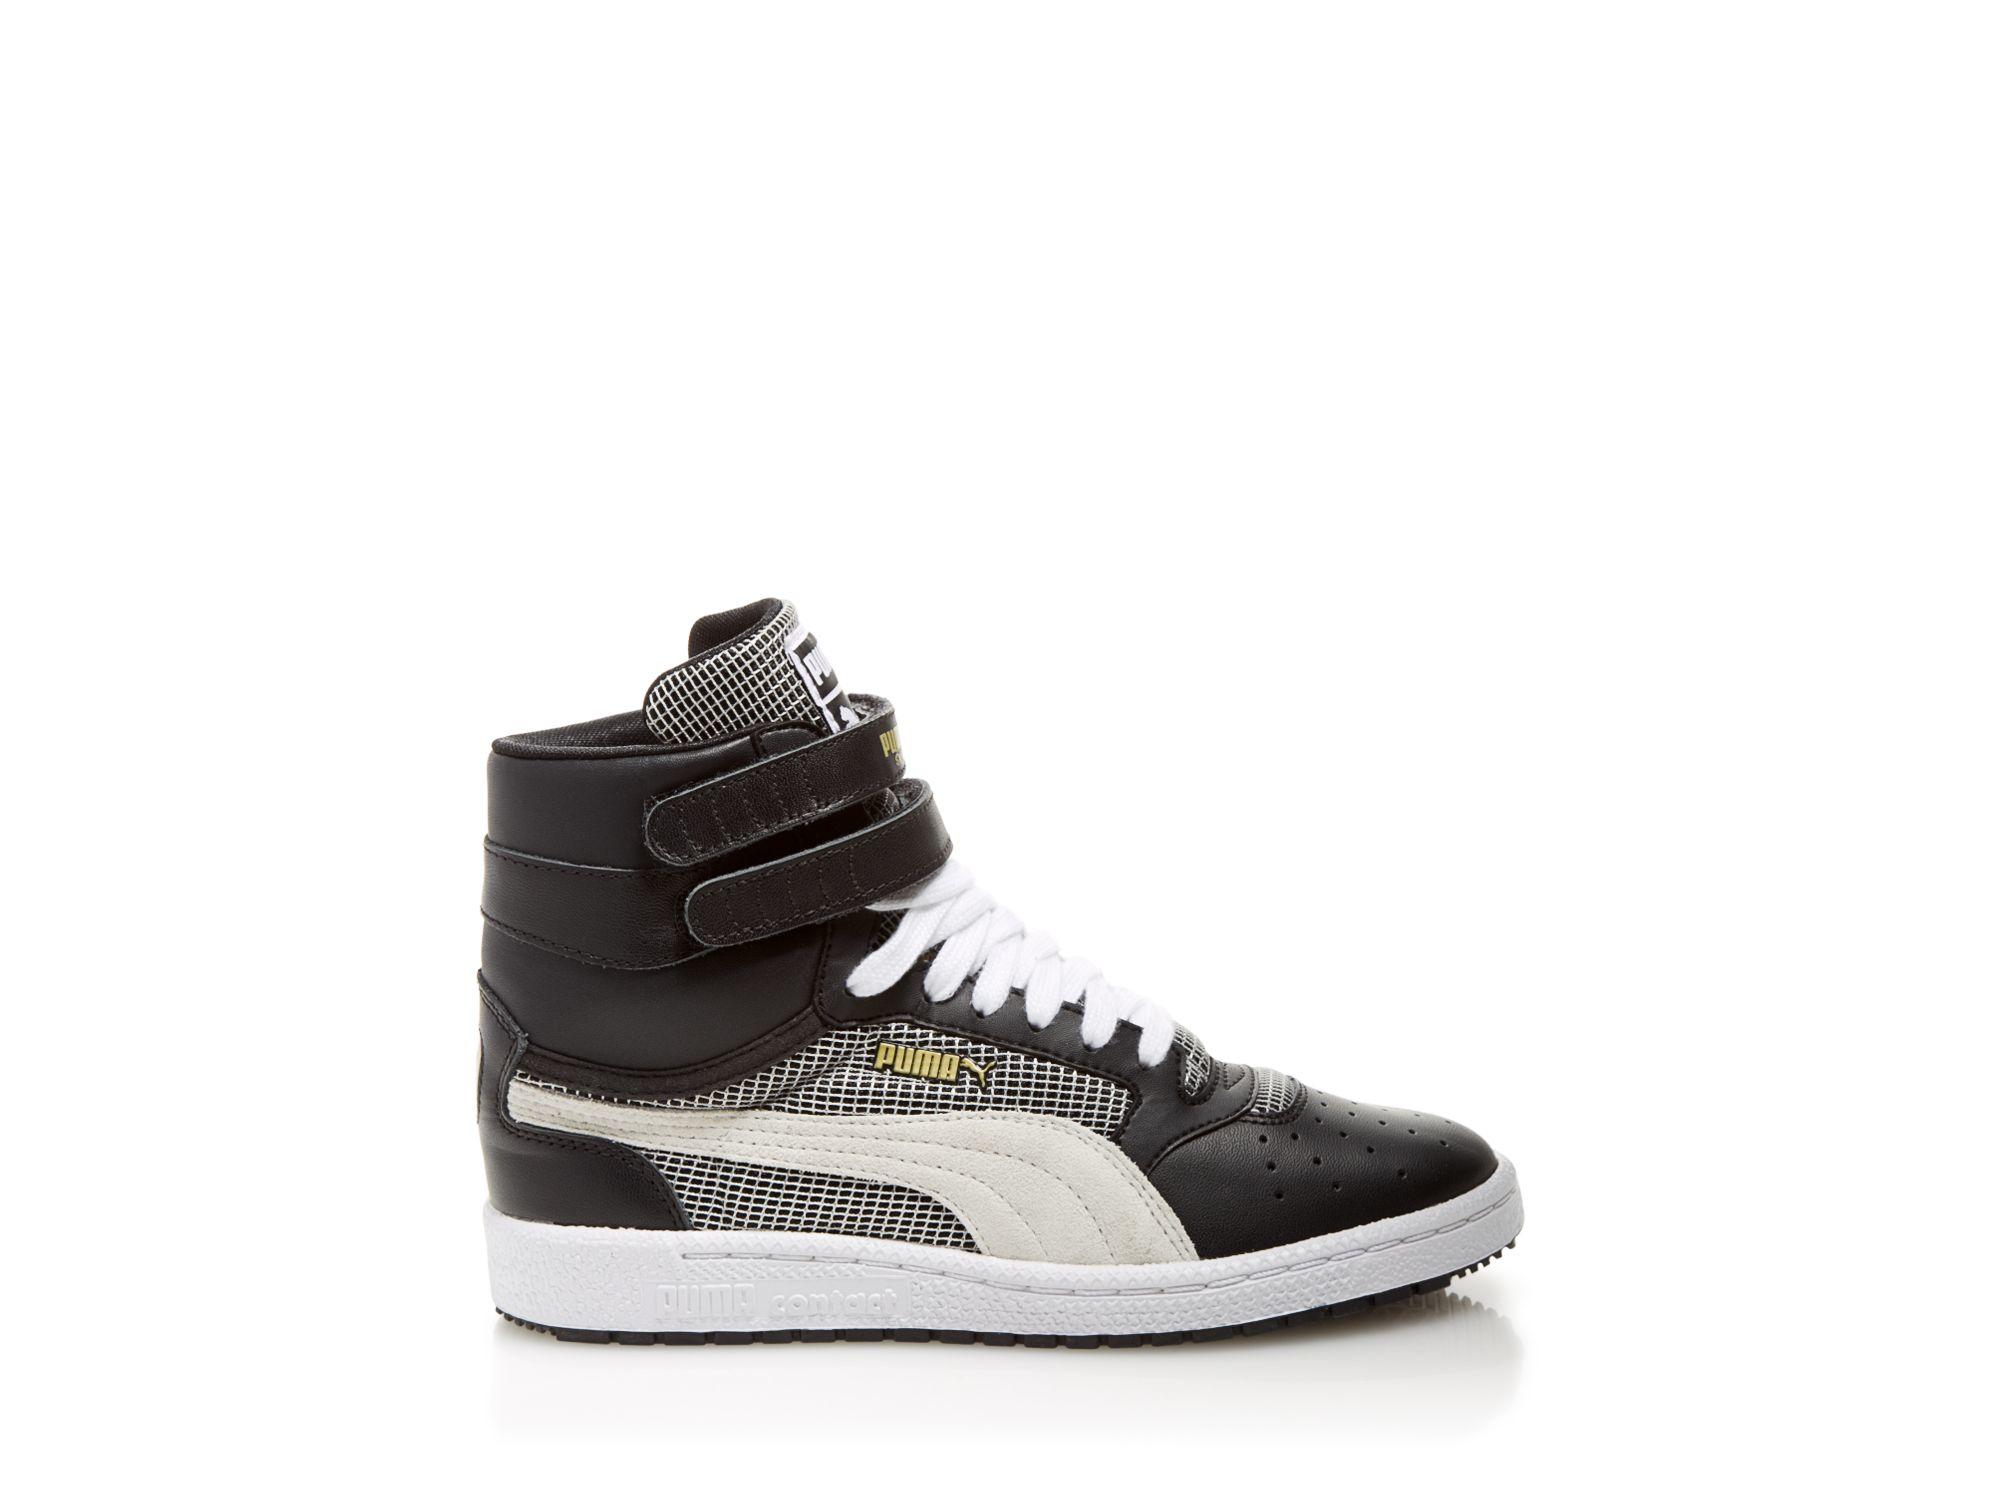 Puma High Top Sneakers Sky Ii Hi Blocks Amp Stripes In